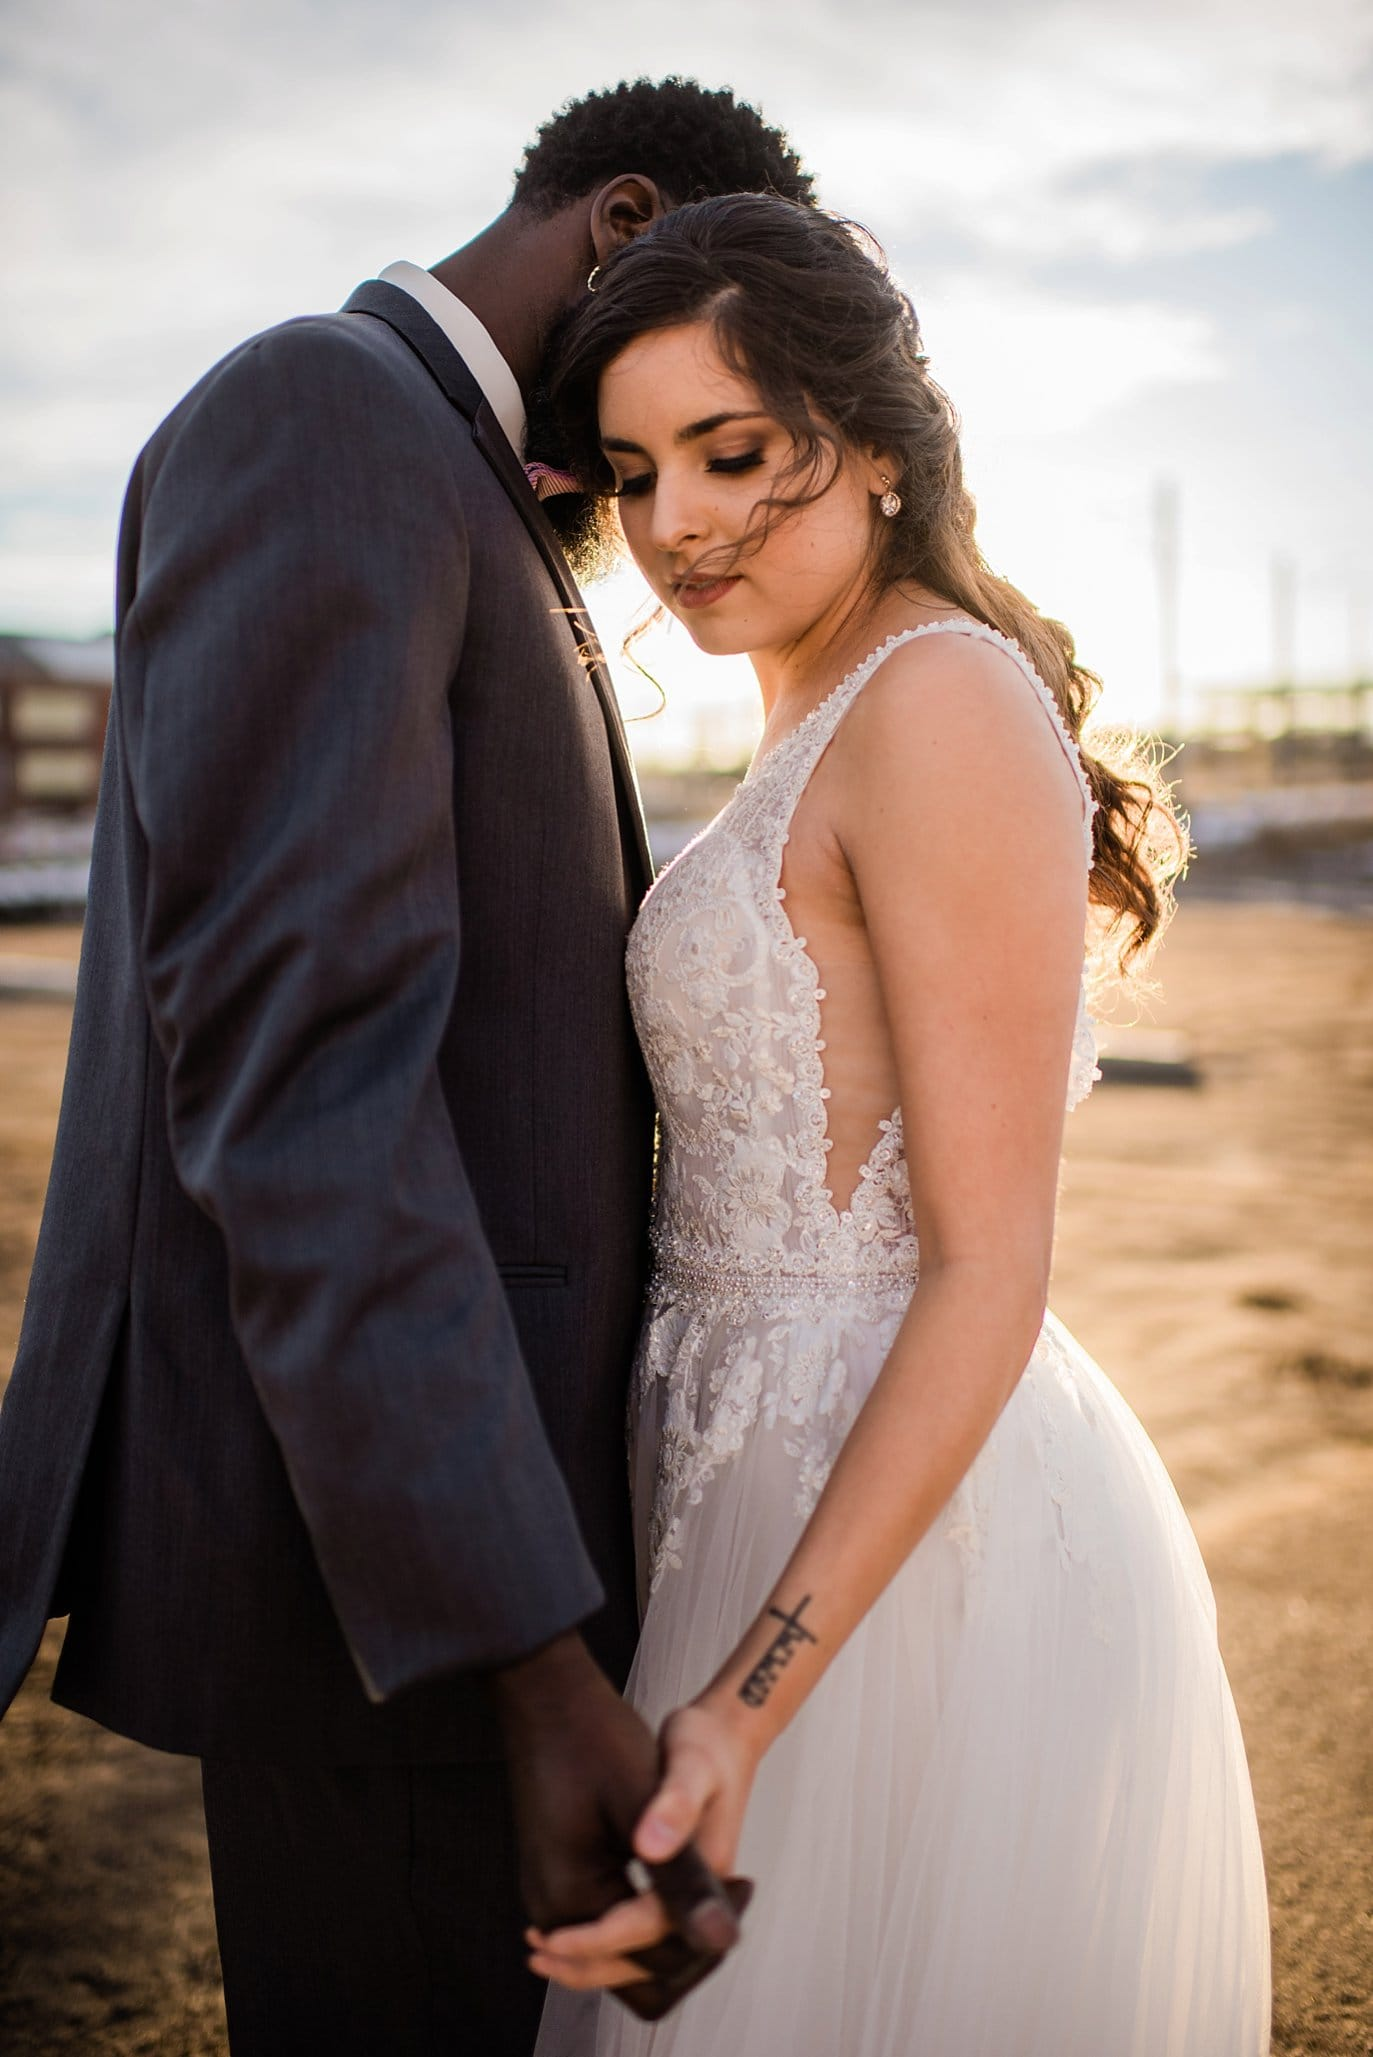 intimate bride and groom industrial wedding photo at Shyft Denver wedding by Aurora wedding photographer Jennie Crate photographer